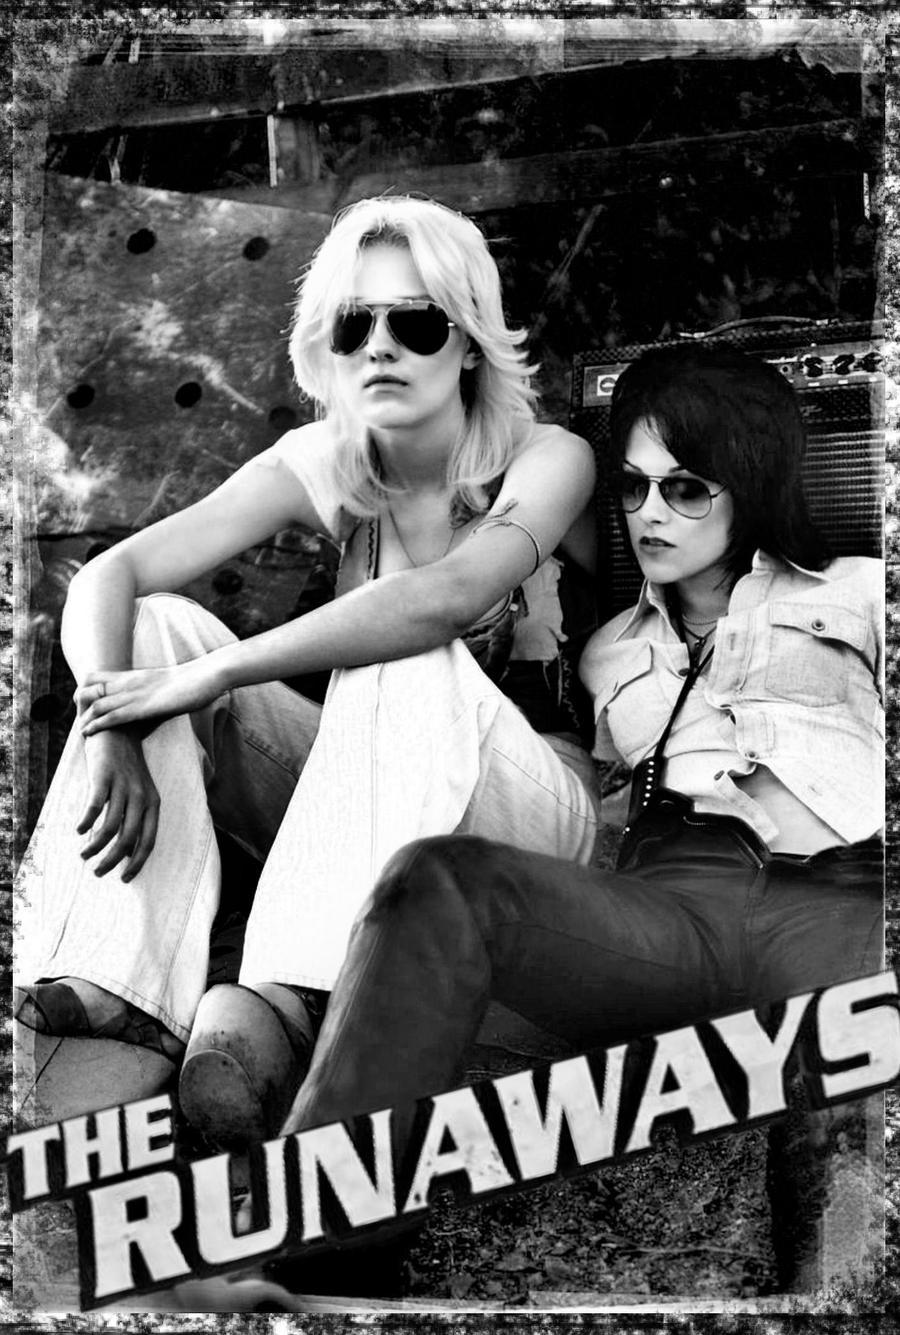 The Runaways Poster by masochisticlove on DeviantArt